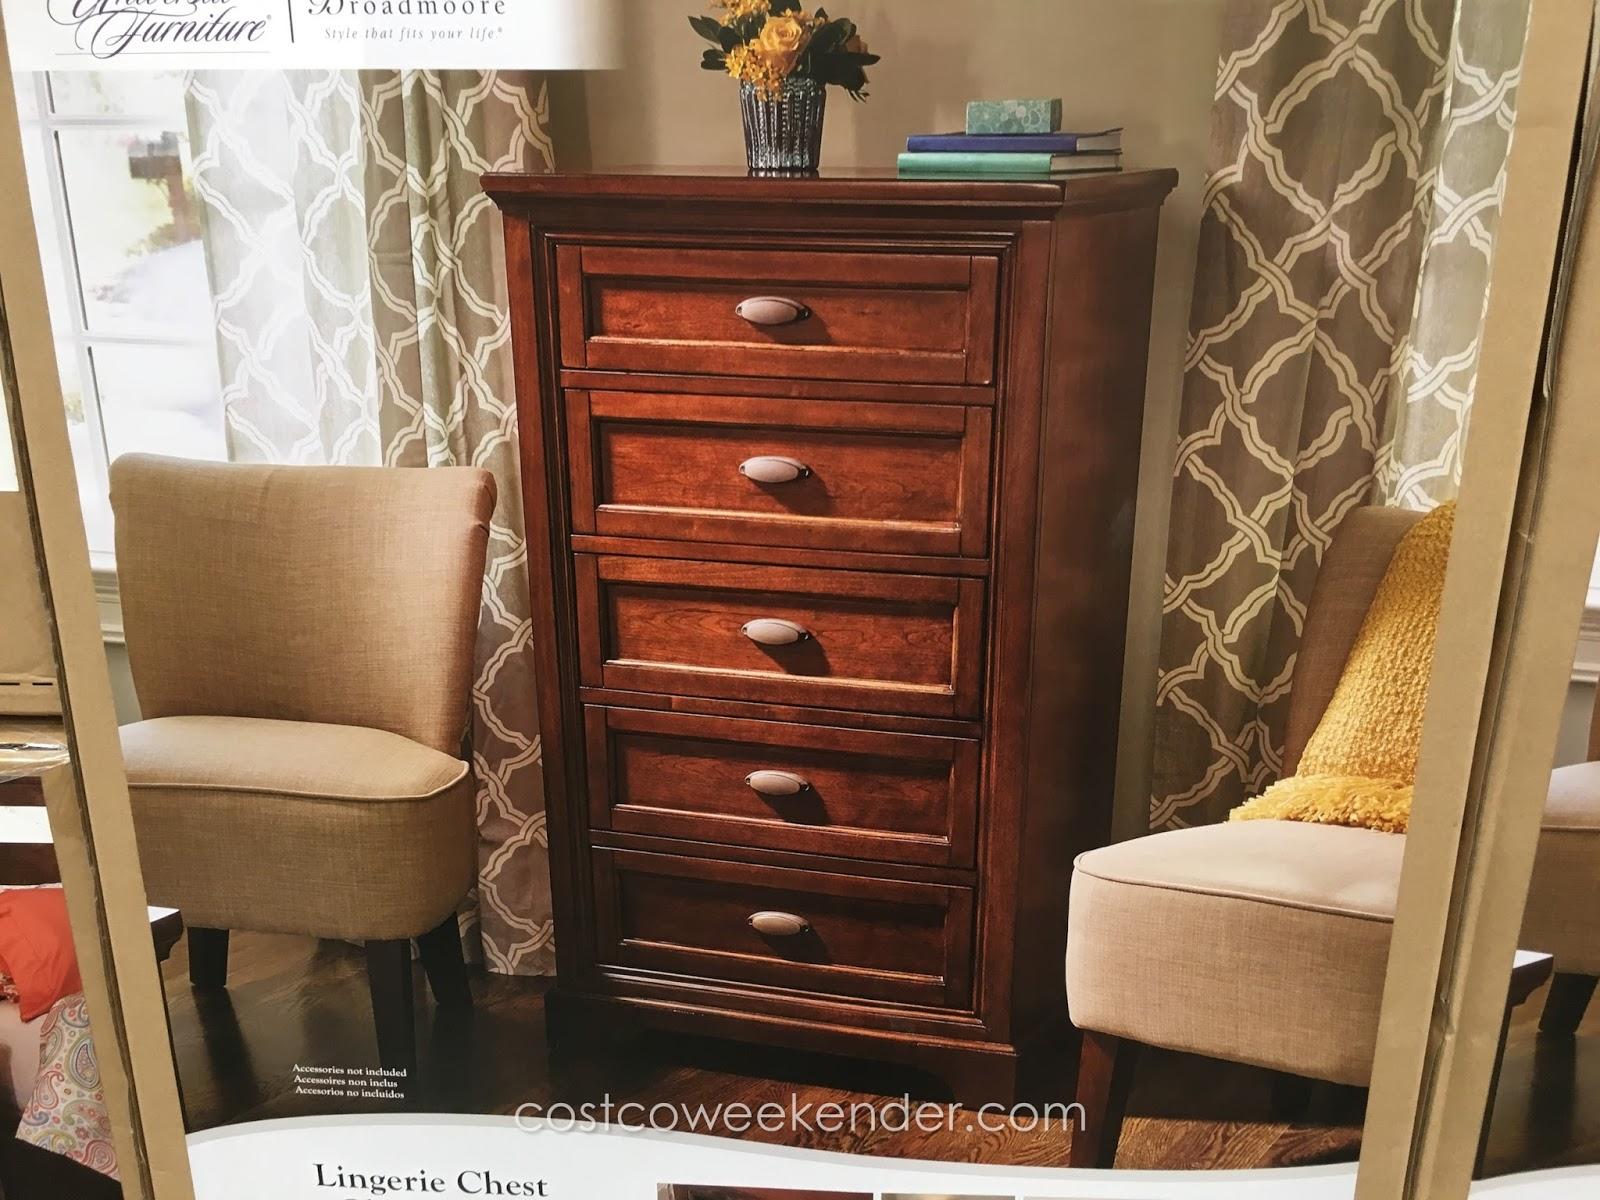 Universal Furniture Broadmoore Lingerie Chest Costco Weekender